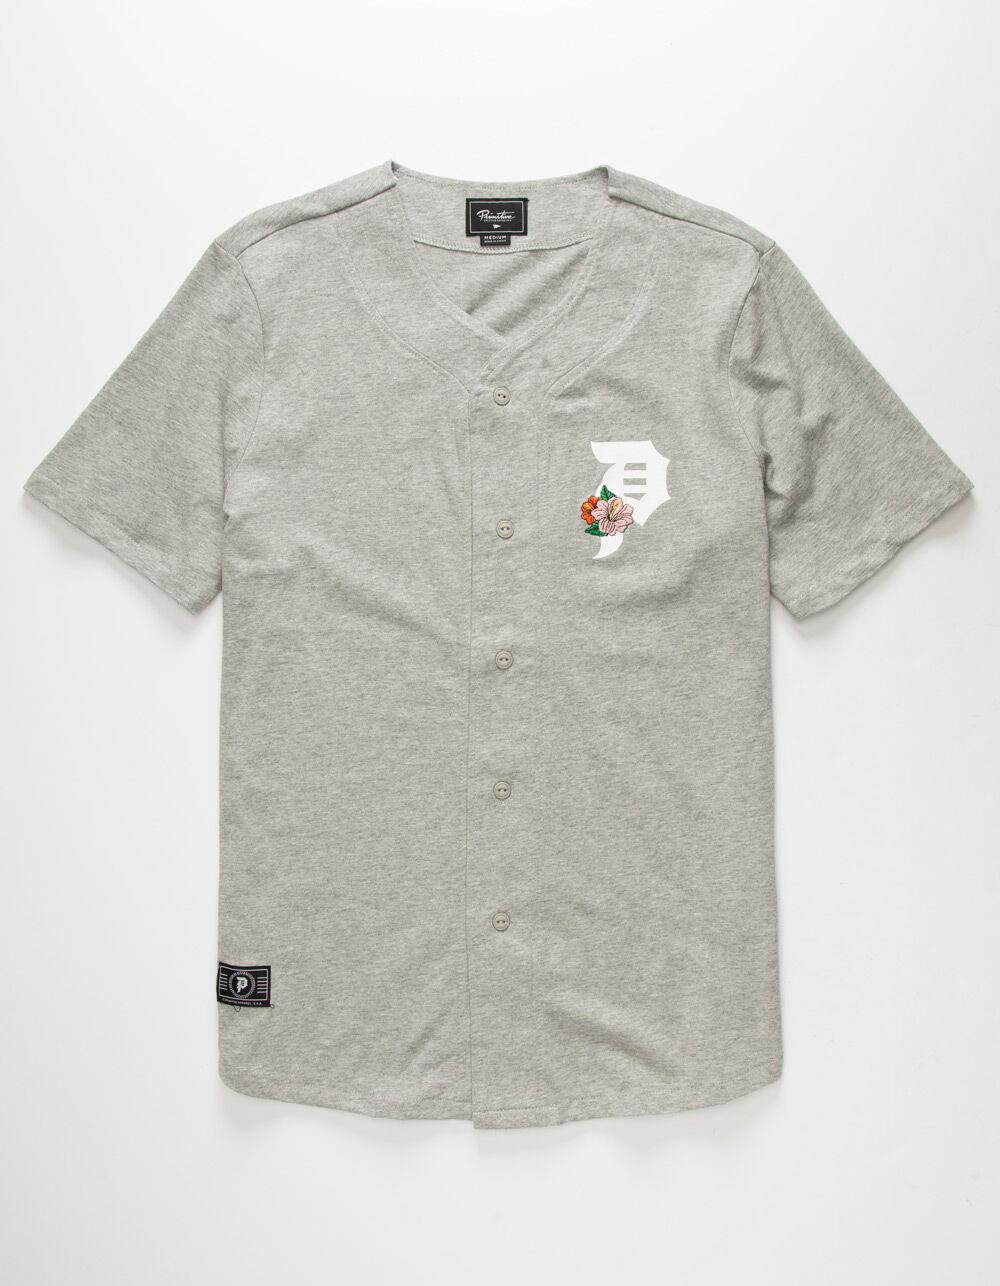 PRIMITIVE Hibiscus Baseball Gray Jersey T-Shirt